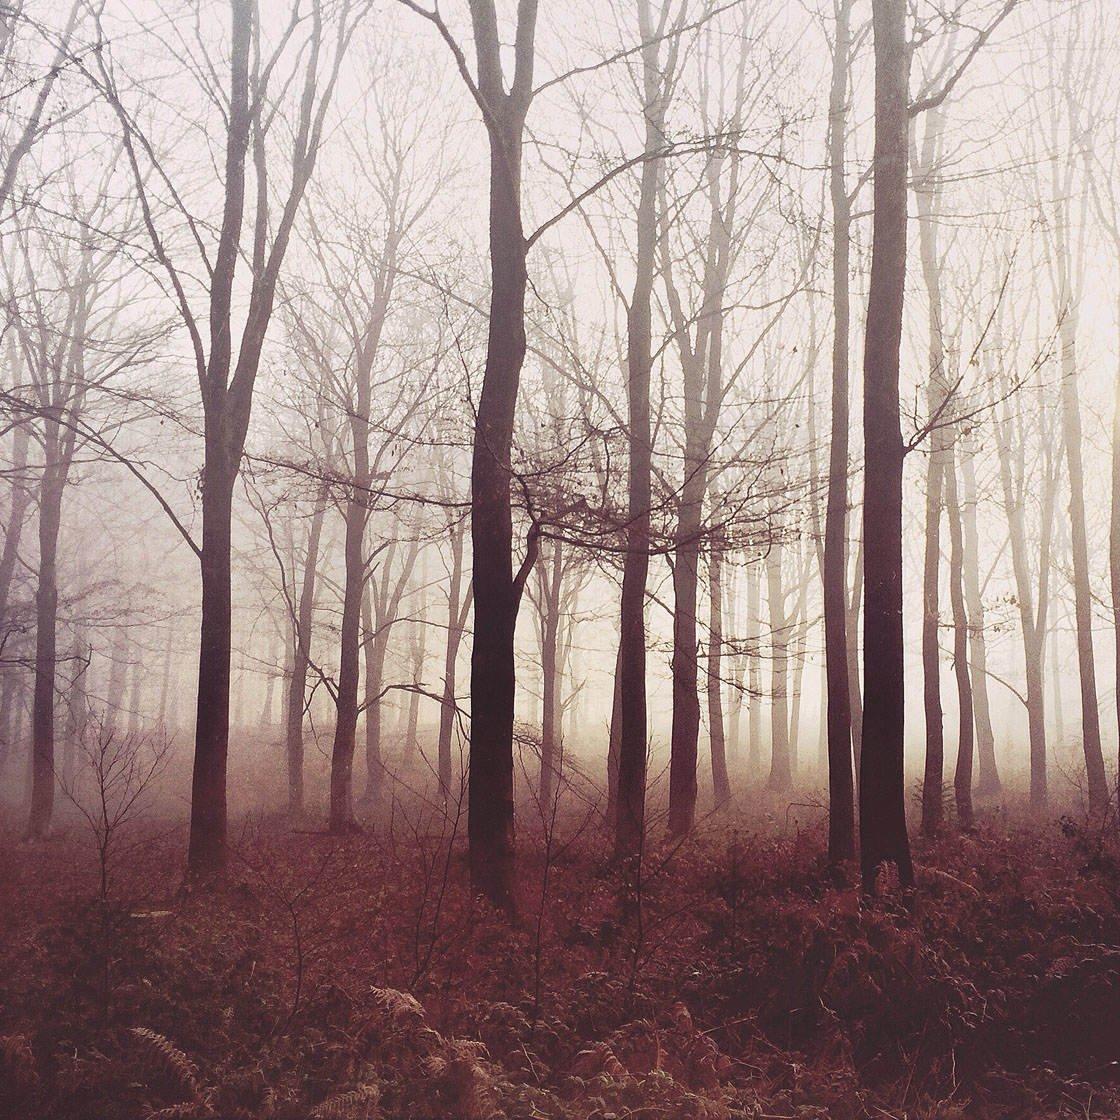 Fog & Mist iPhone Photos 39 no script